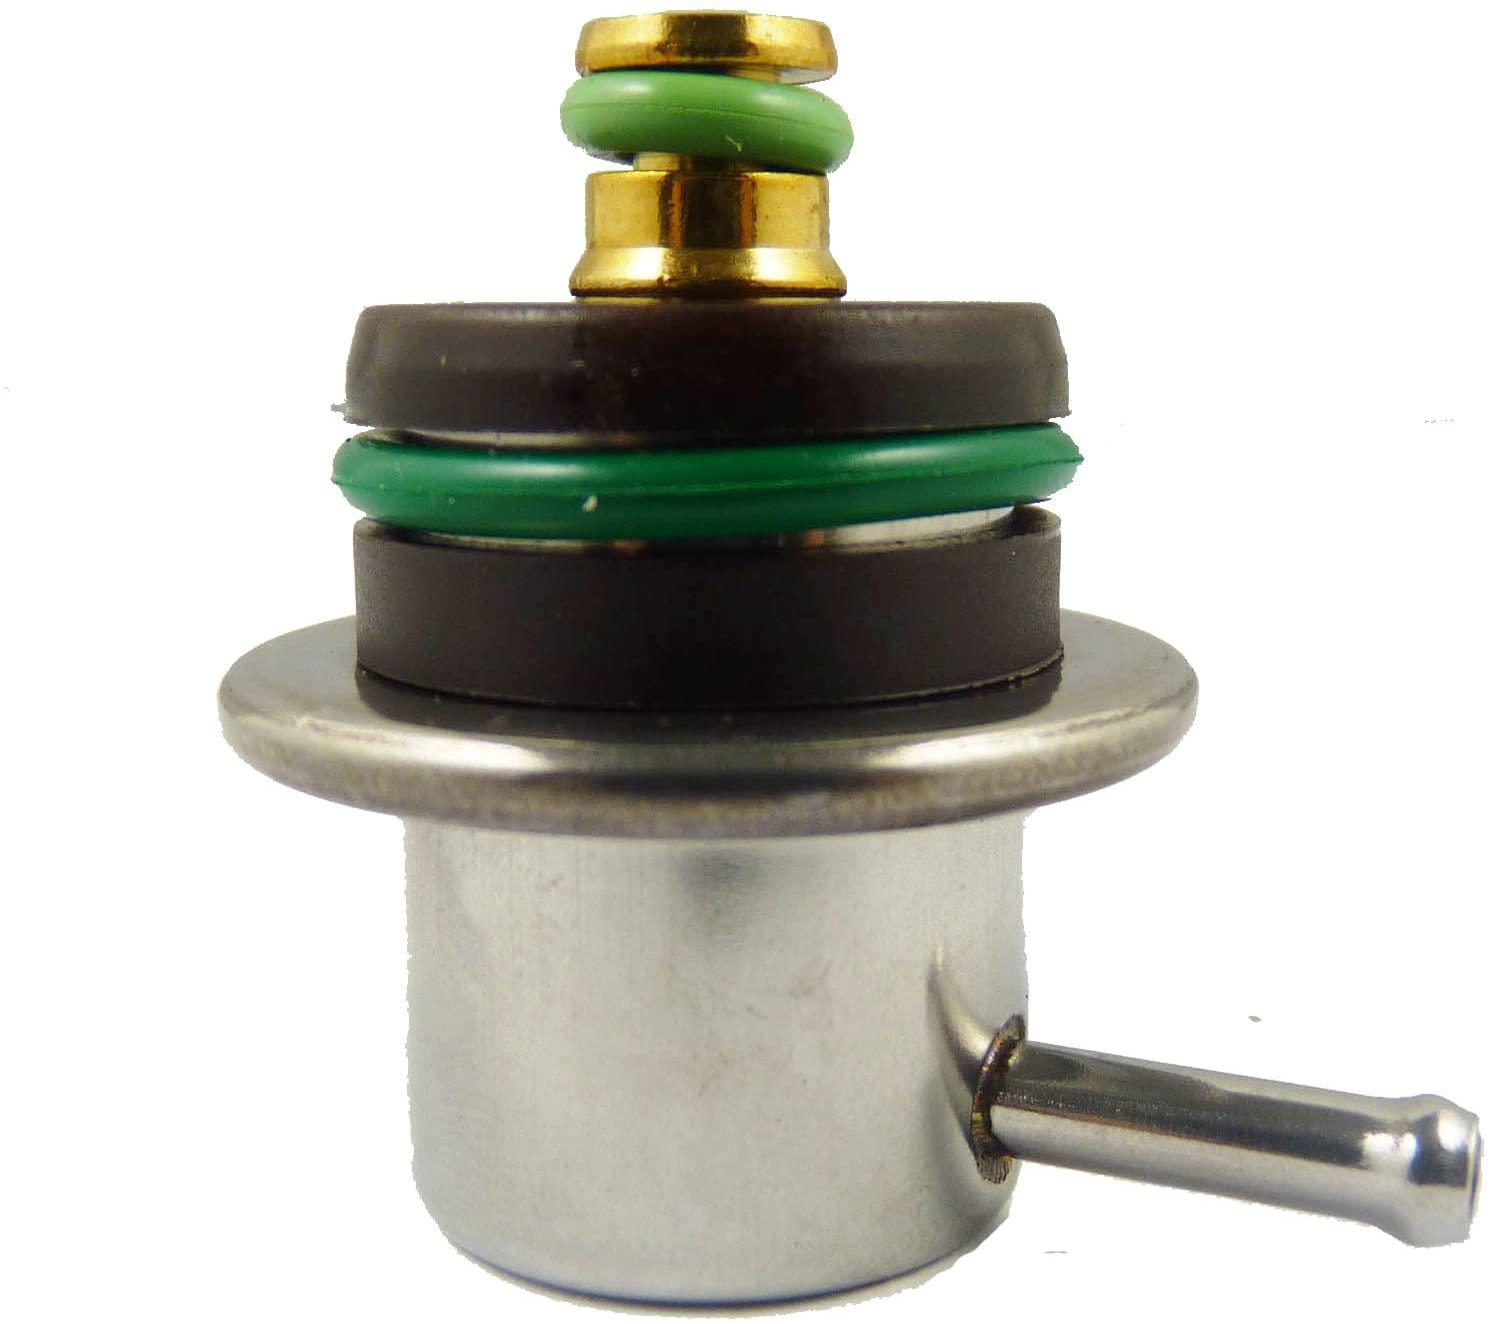 NEW Fuel Pressure Regulator Adjuster 078133534C For VW Golf Jetta Passat Audi A4 A6 1992-2006